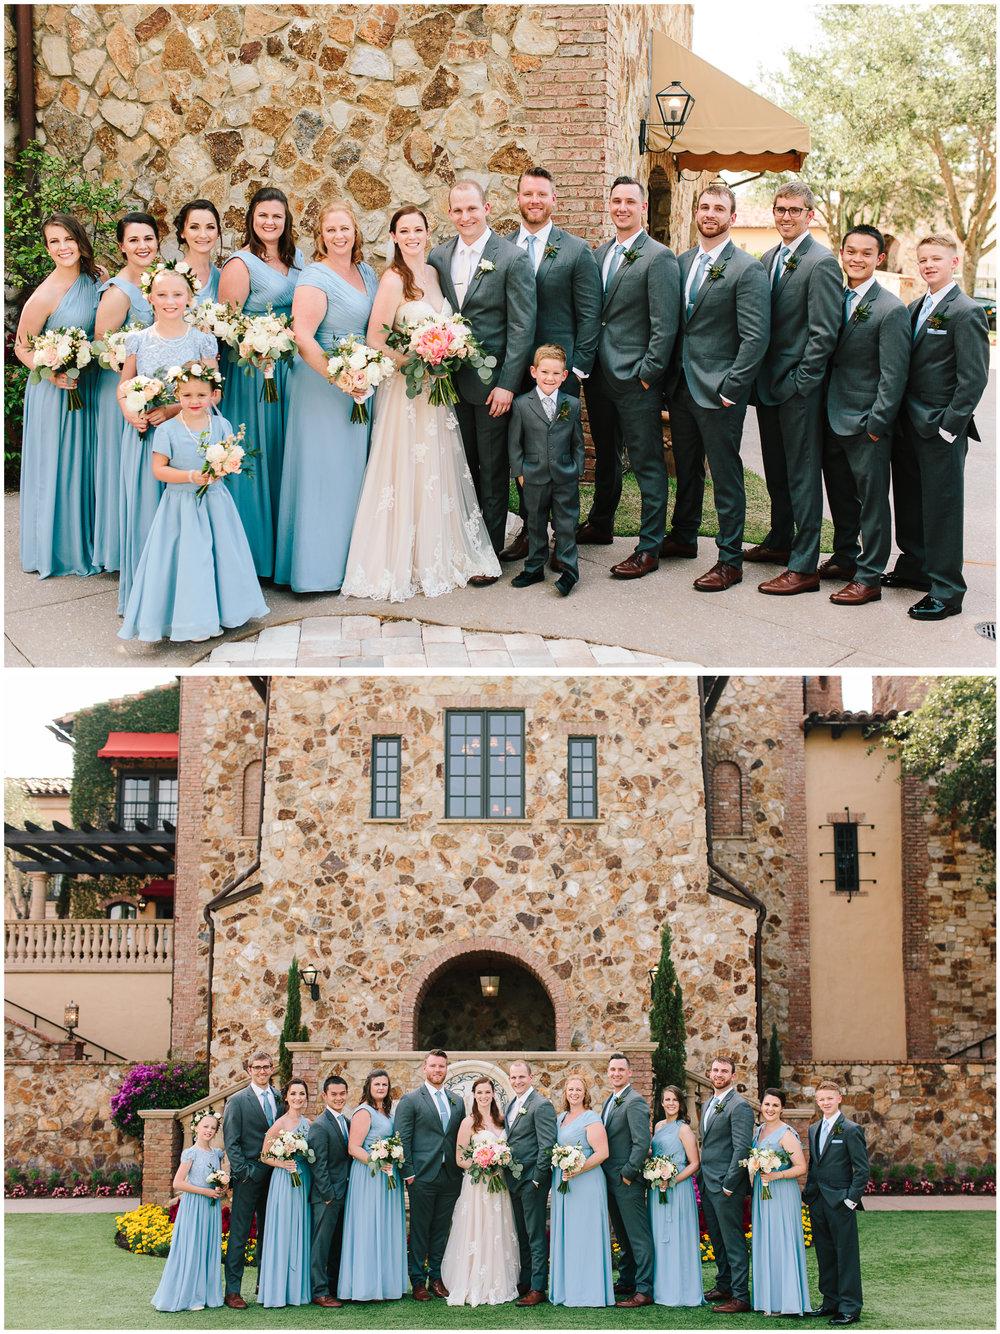 bella_collina_wedding_56.jpg